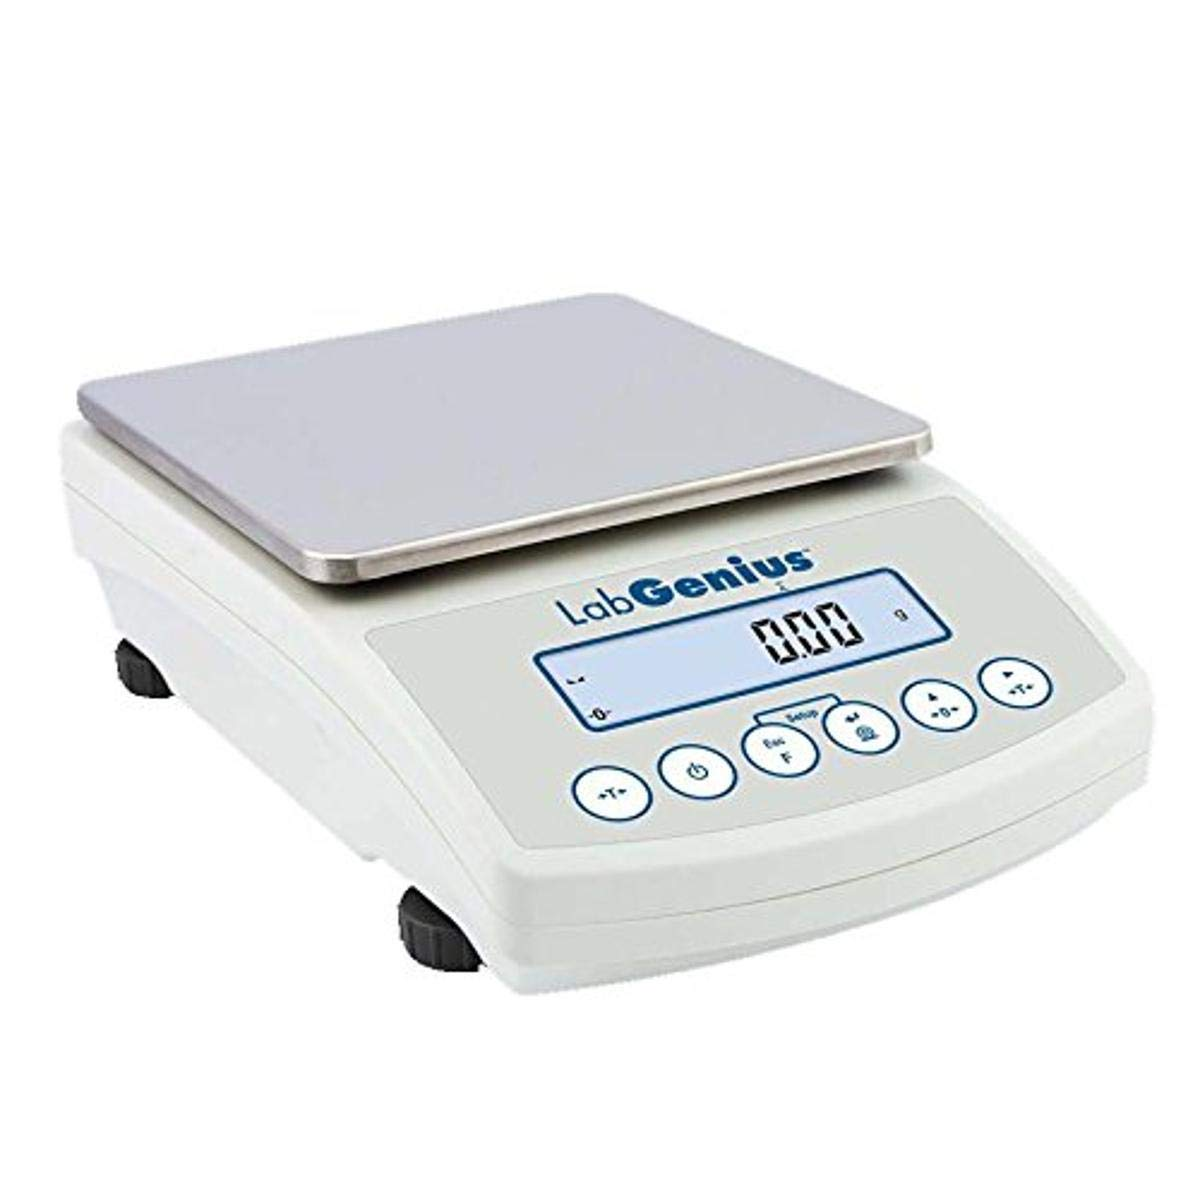 LabGenius DSH-20001 Max 48% OFF Silver High Max 80% OFF Capacity Balance DSH- Precision